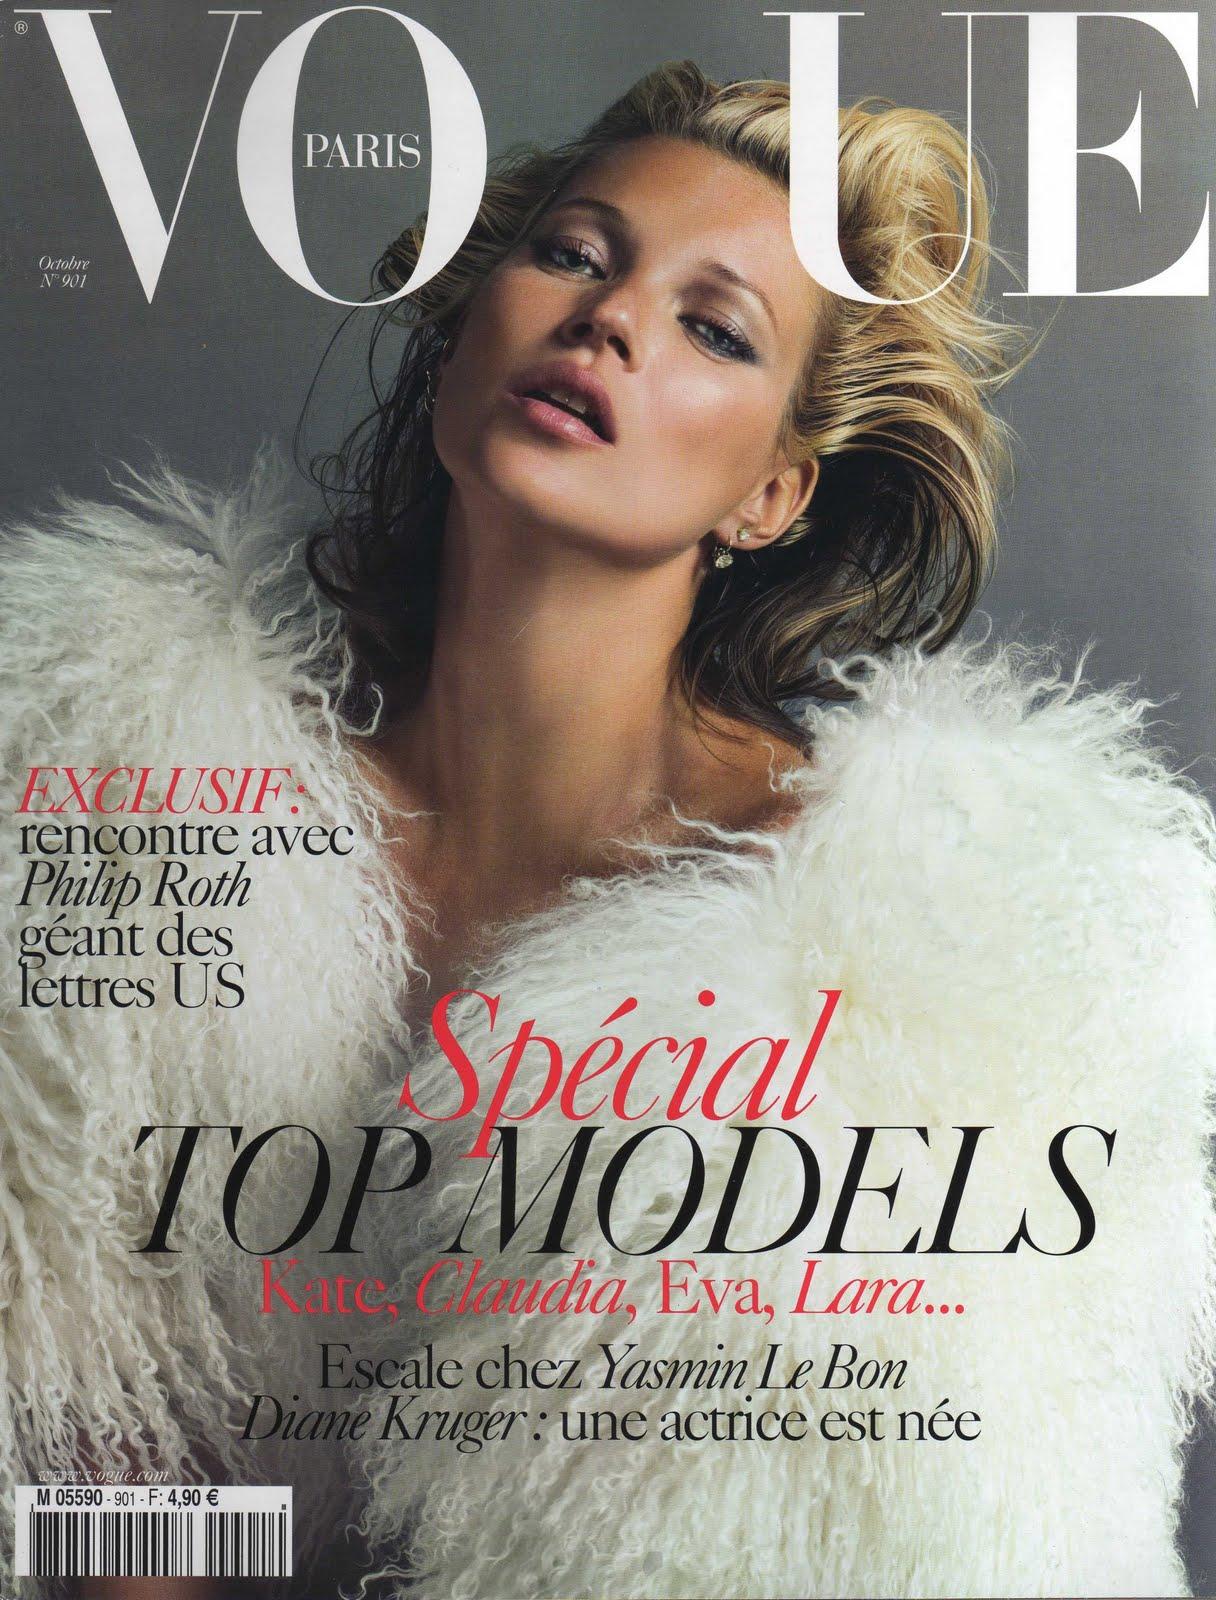 http://3.bp.blogspot.com/_DgJL0hPnjrI/TM0u98L0X2I/AAAAAAAARB4/AmMxSsh_XSM/s1600/Kate_Moss_-_Vogue_Paris.jpg